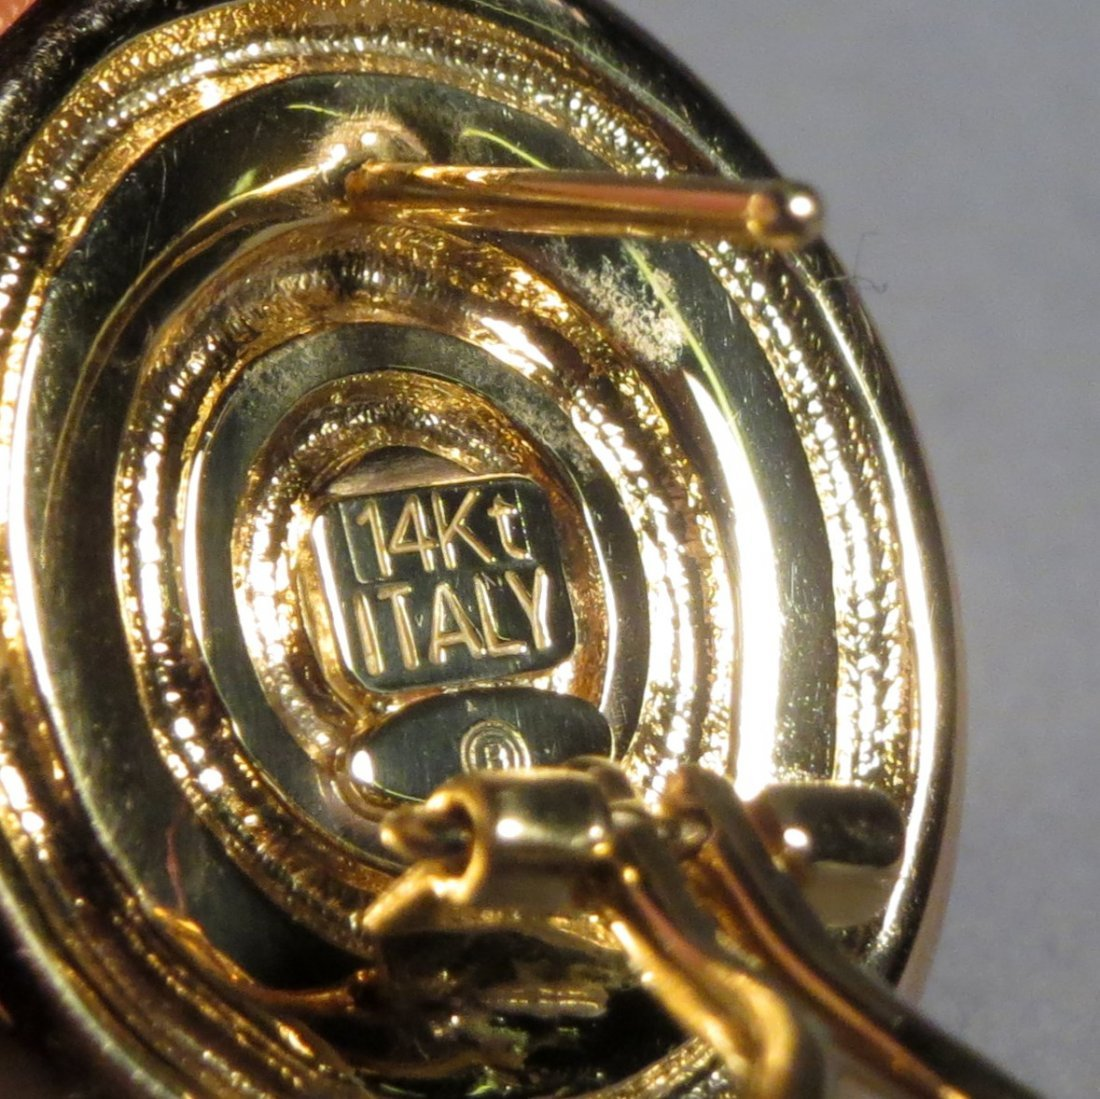 1 Pair 14k Gold Italian Lions Head Earrings - 3